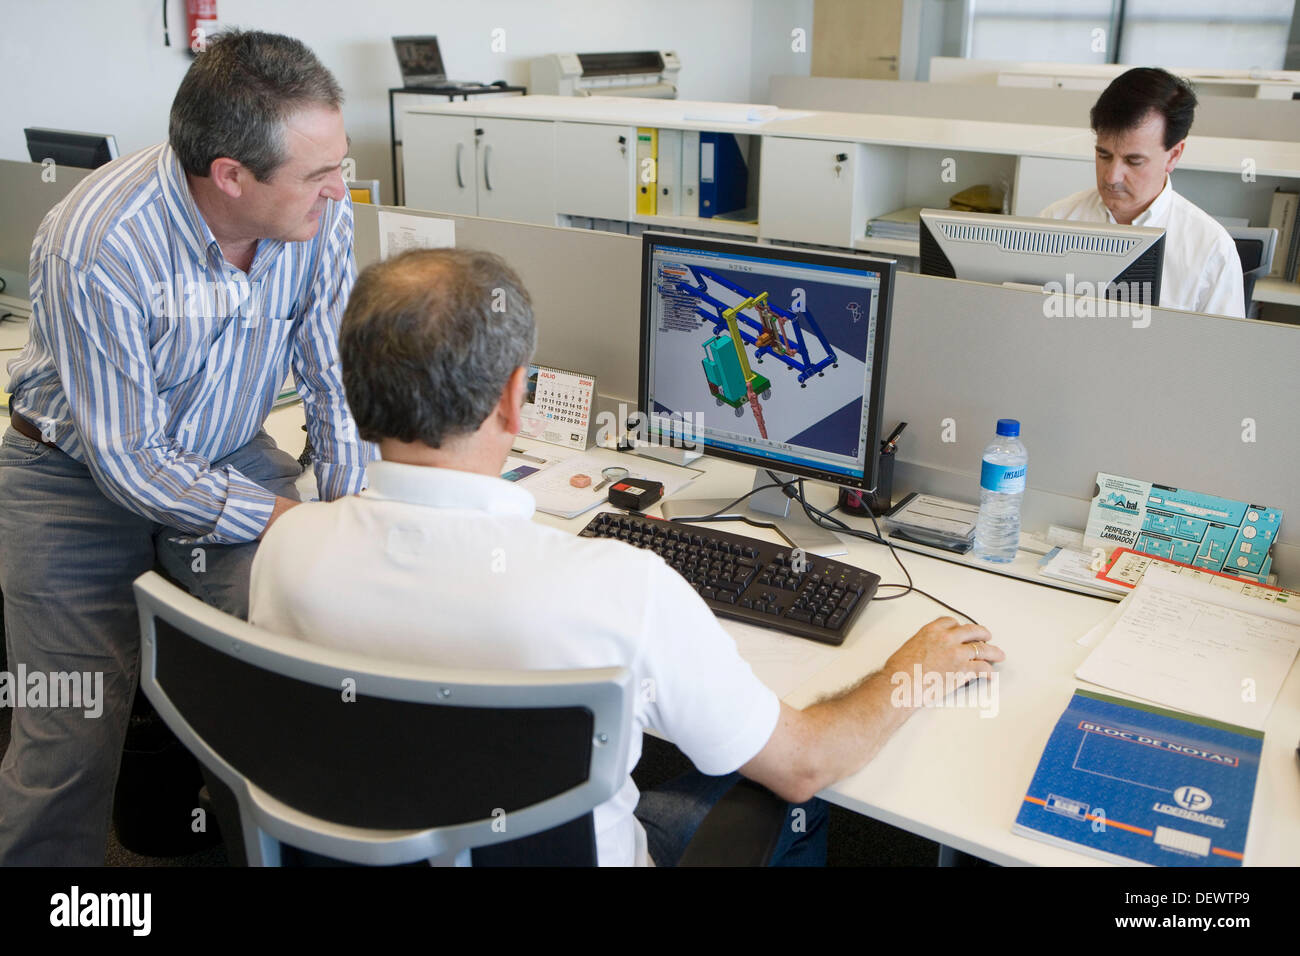 Designers working with  PCs. Cad Cam. Fatronik Foundation, Research Technology Center. Donostia, San Sebastian, Gipuzkoa, - Stock Image